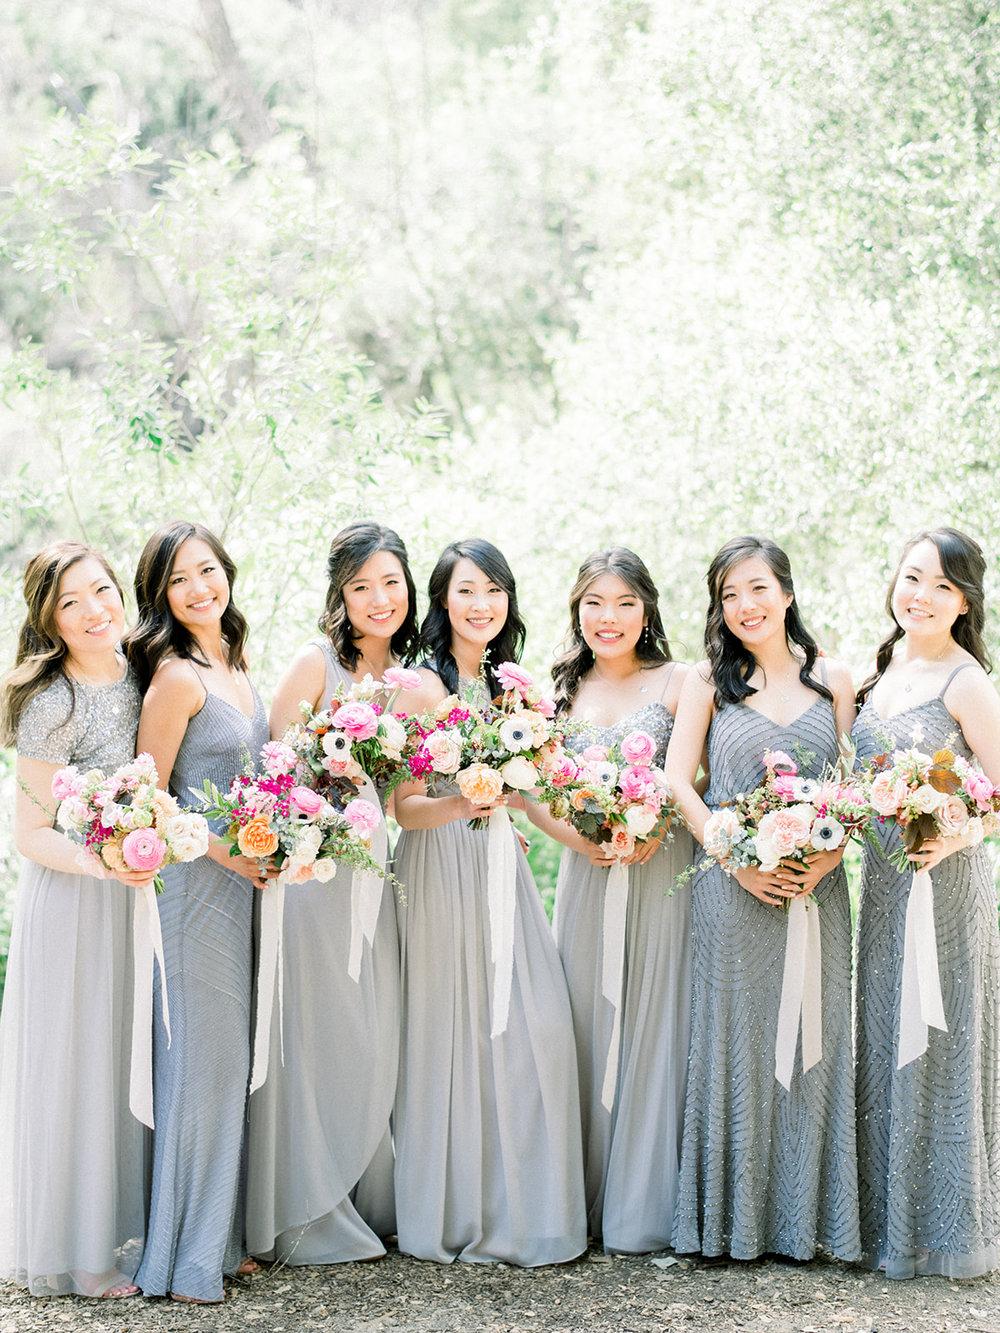 jueunandjon-etherandsmith-wedding-470.jpg